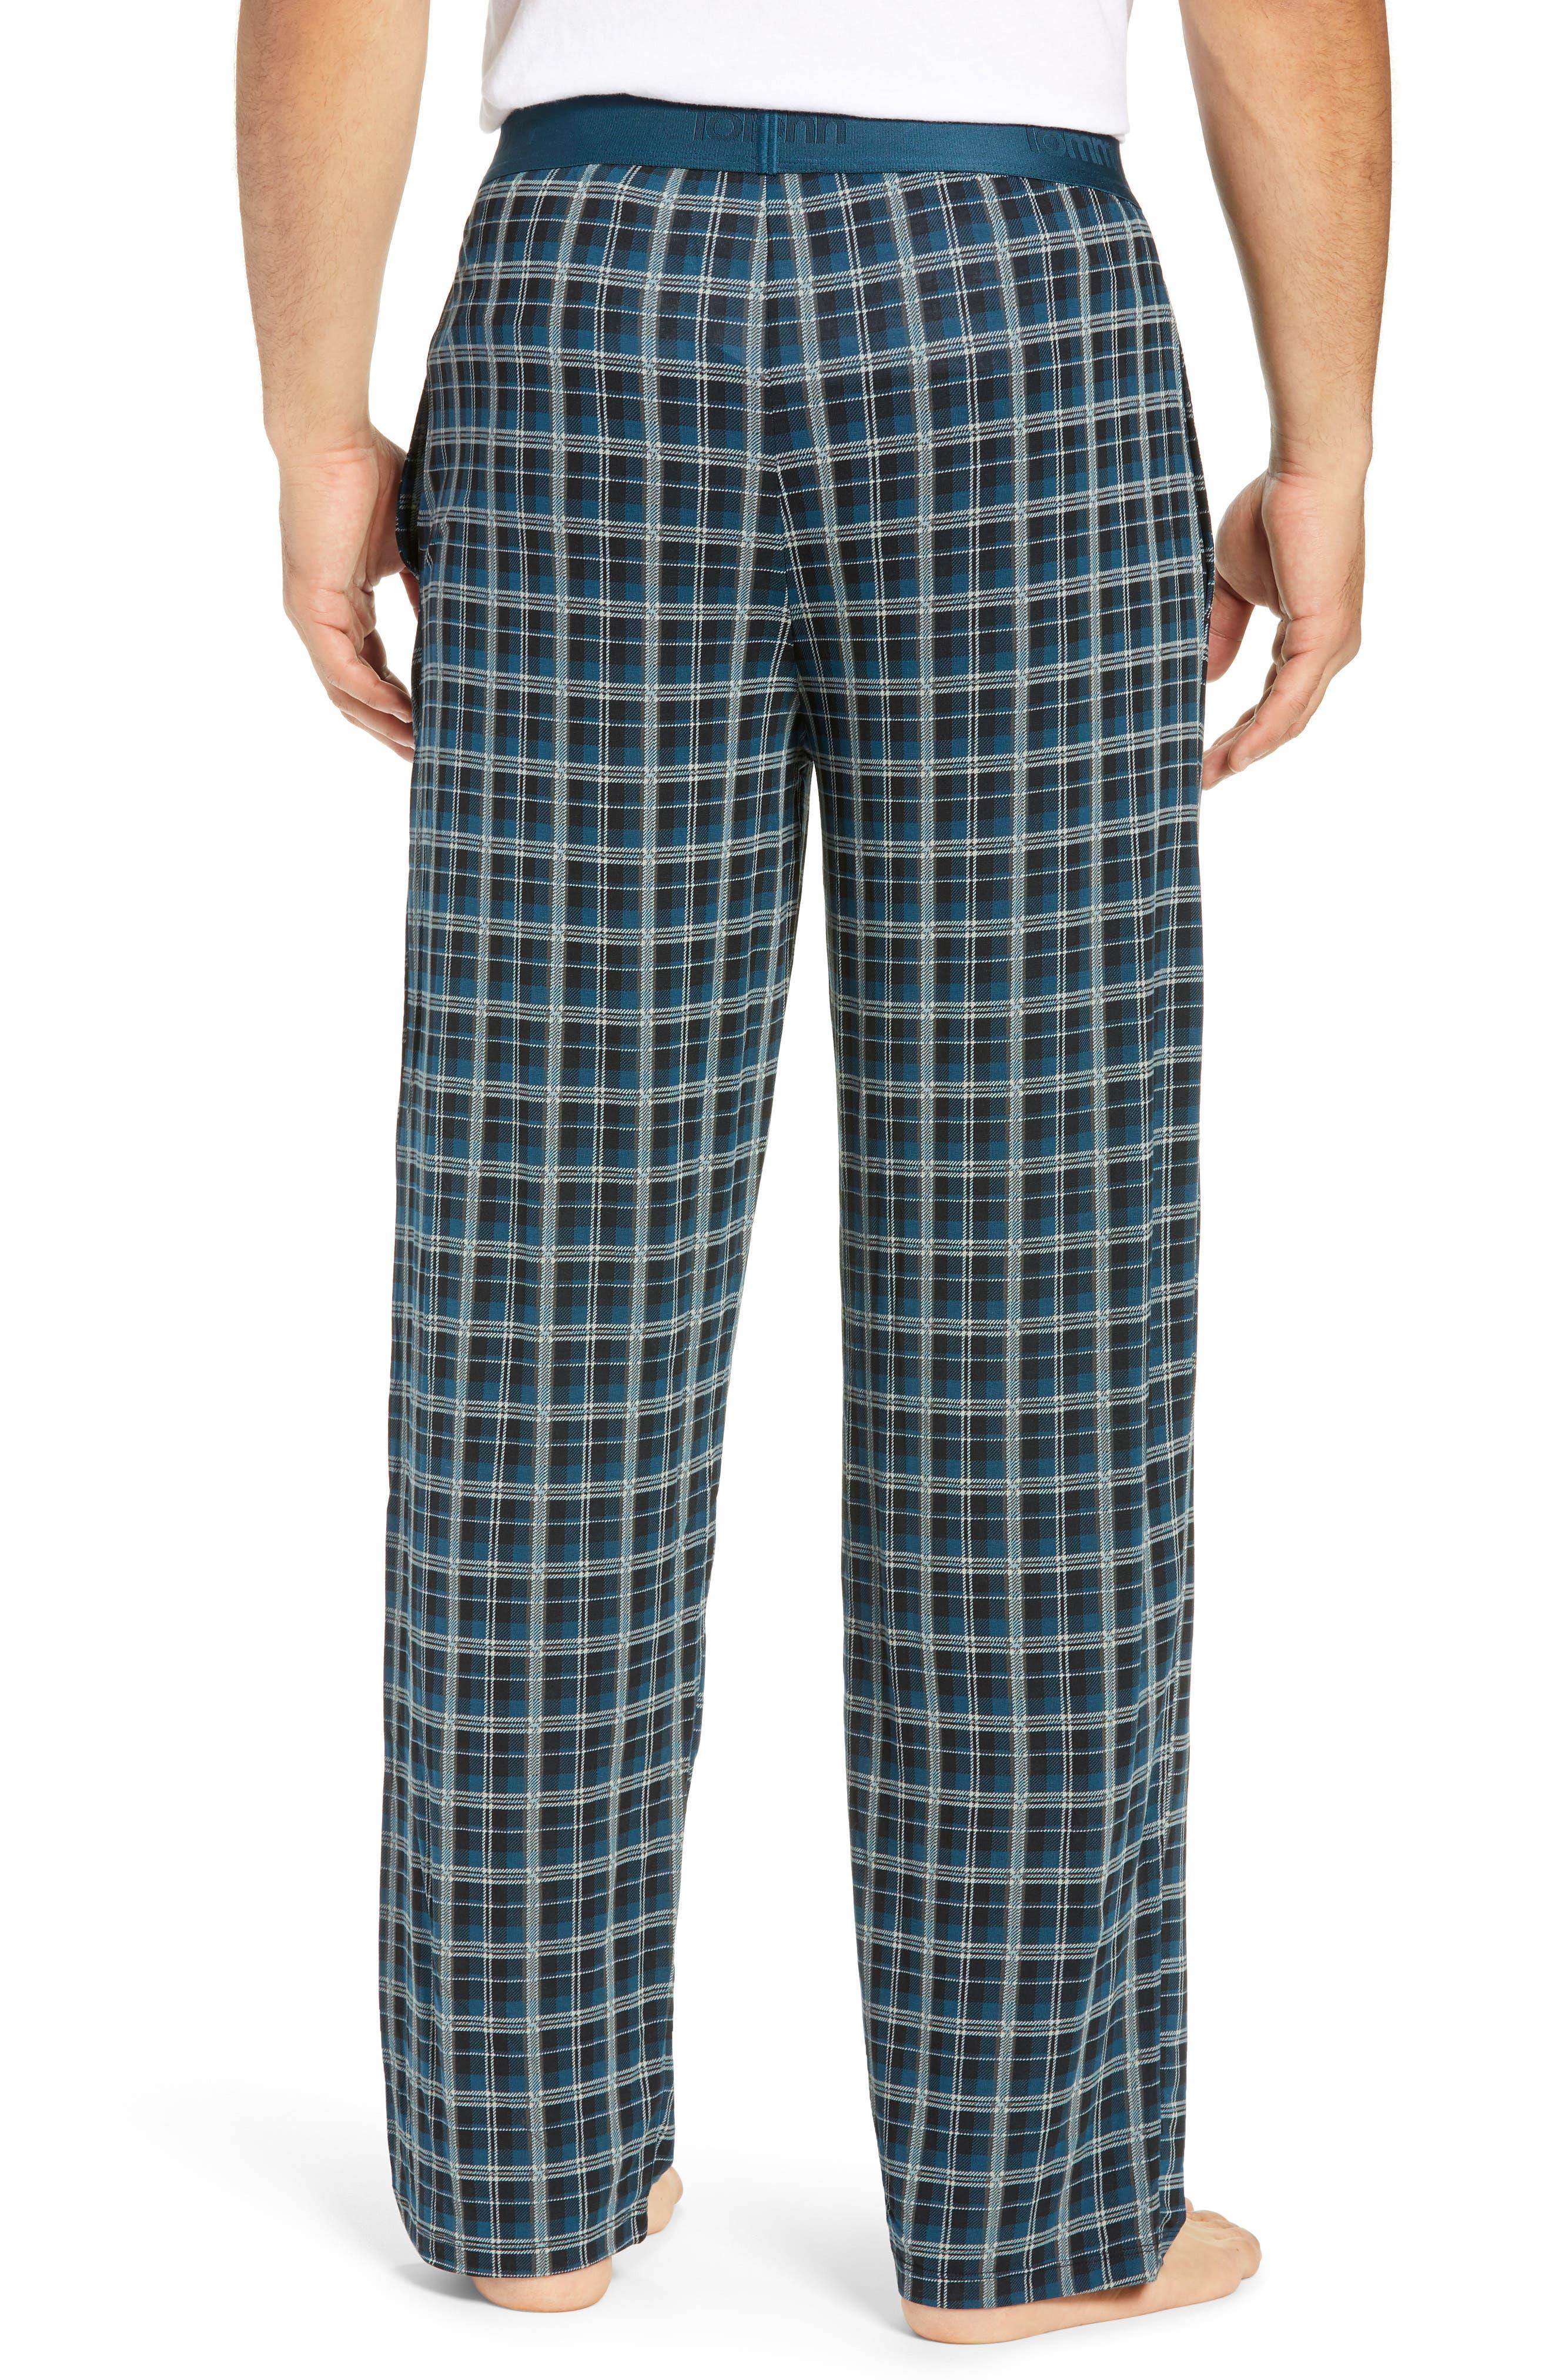 Second Skin Stretch Modal Pajama Pants,                             Alternate thumbnail 2, color,                             REFLECTING POND PLAID